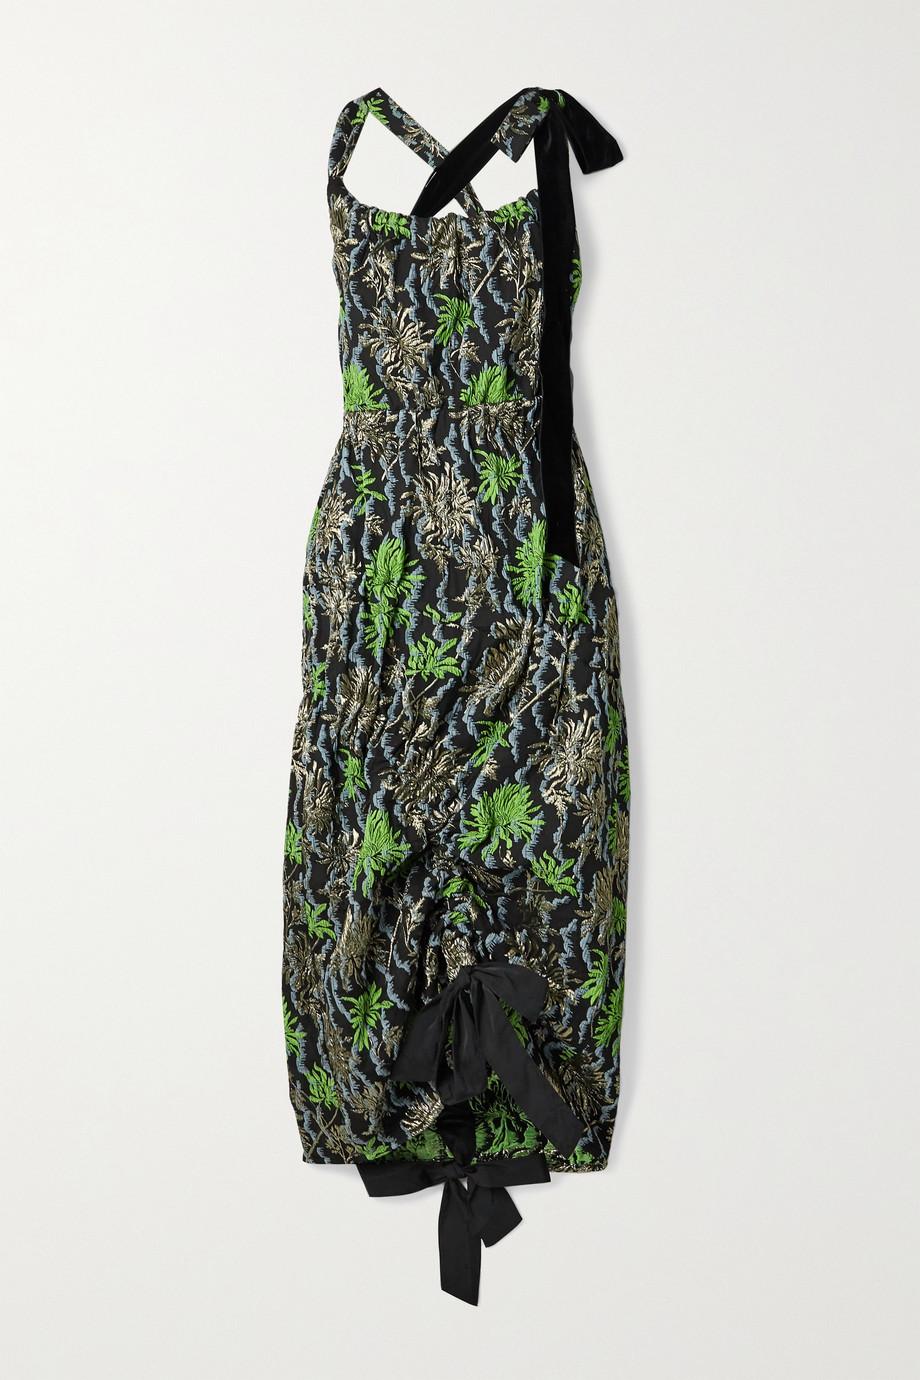 Meryll Rogge Asymmetric velvet-trimmed metallic cloqué-jacquard dress